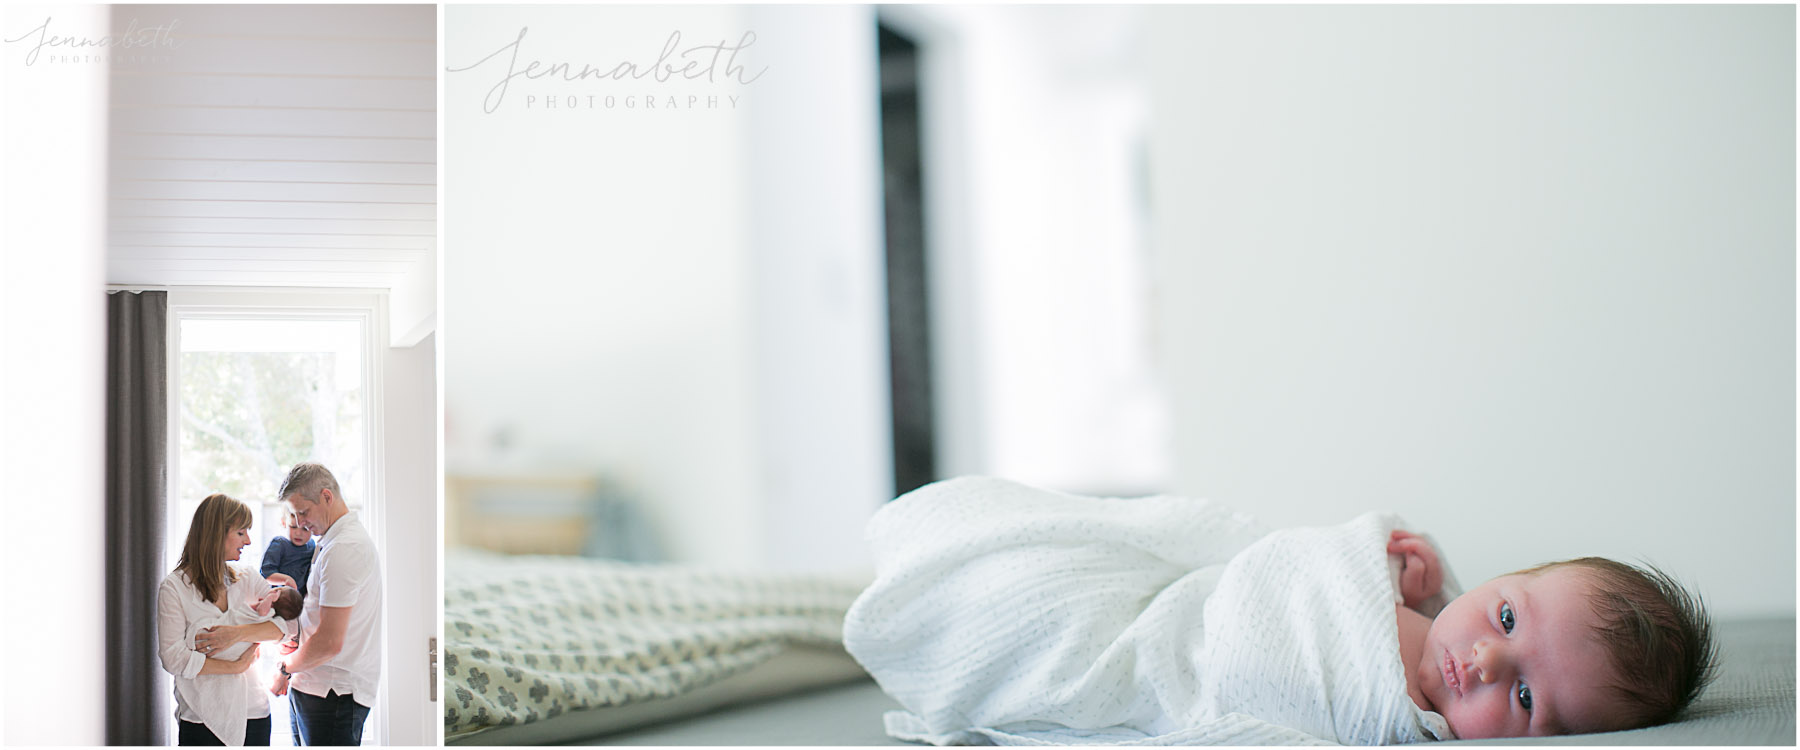 JennaBethPhotography-Simone-1.jpg